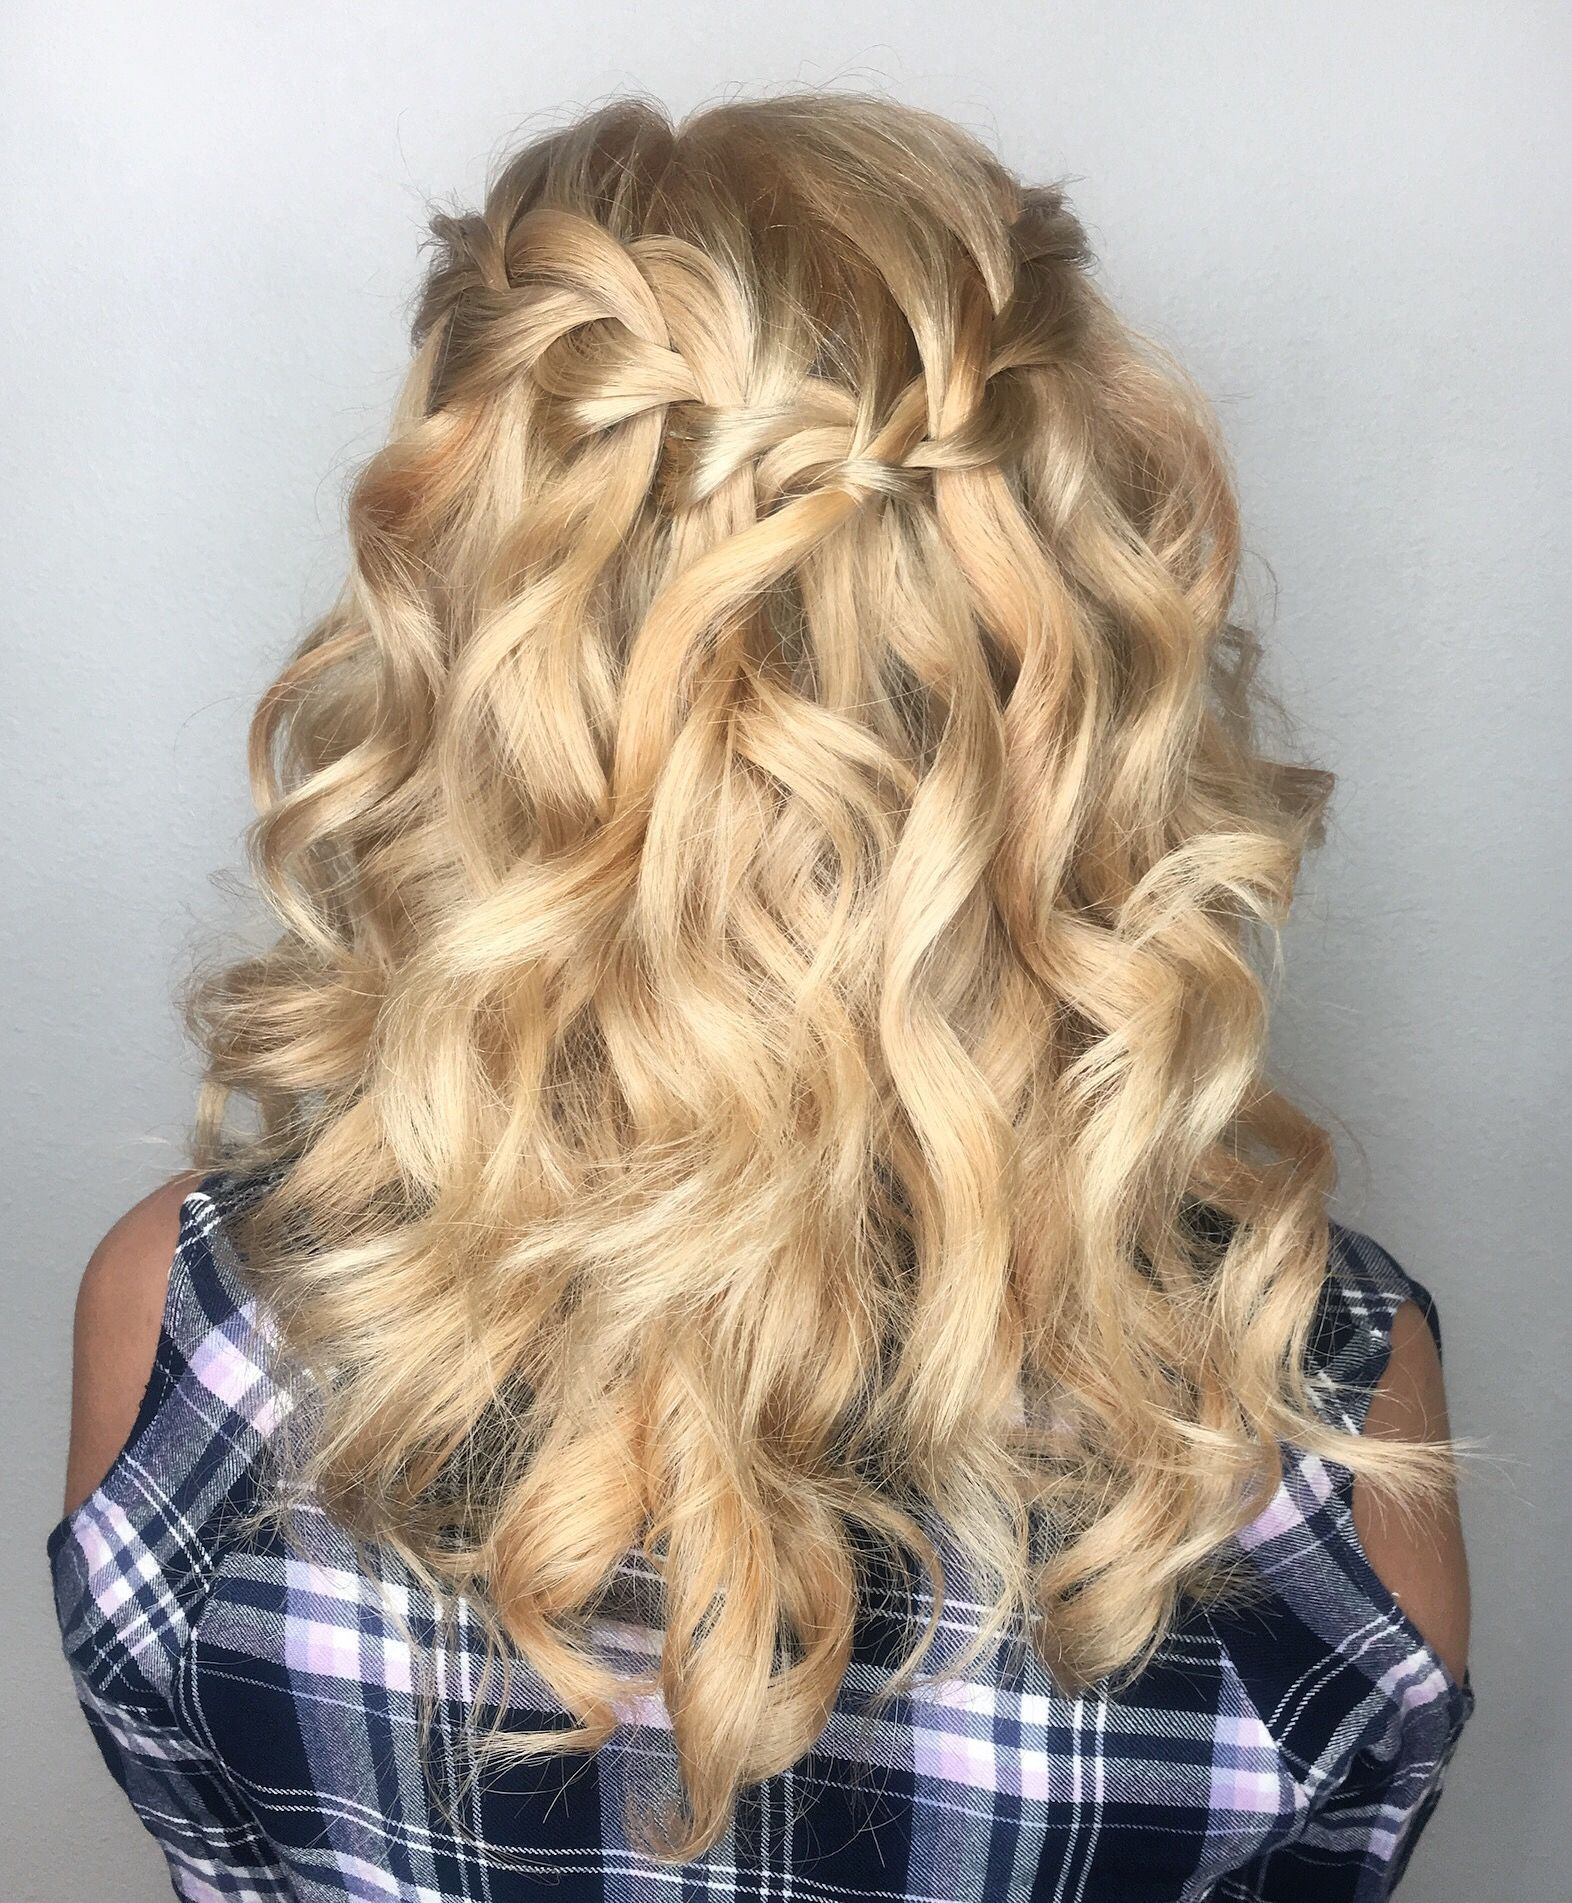 Waterfall braid. Braided hairstyles. Half up half down ...